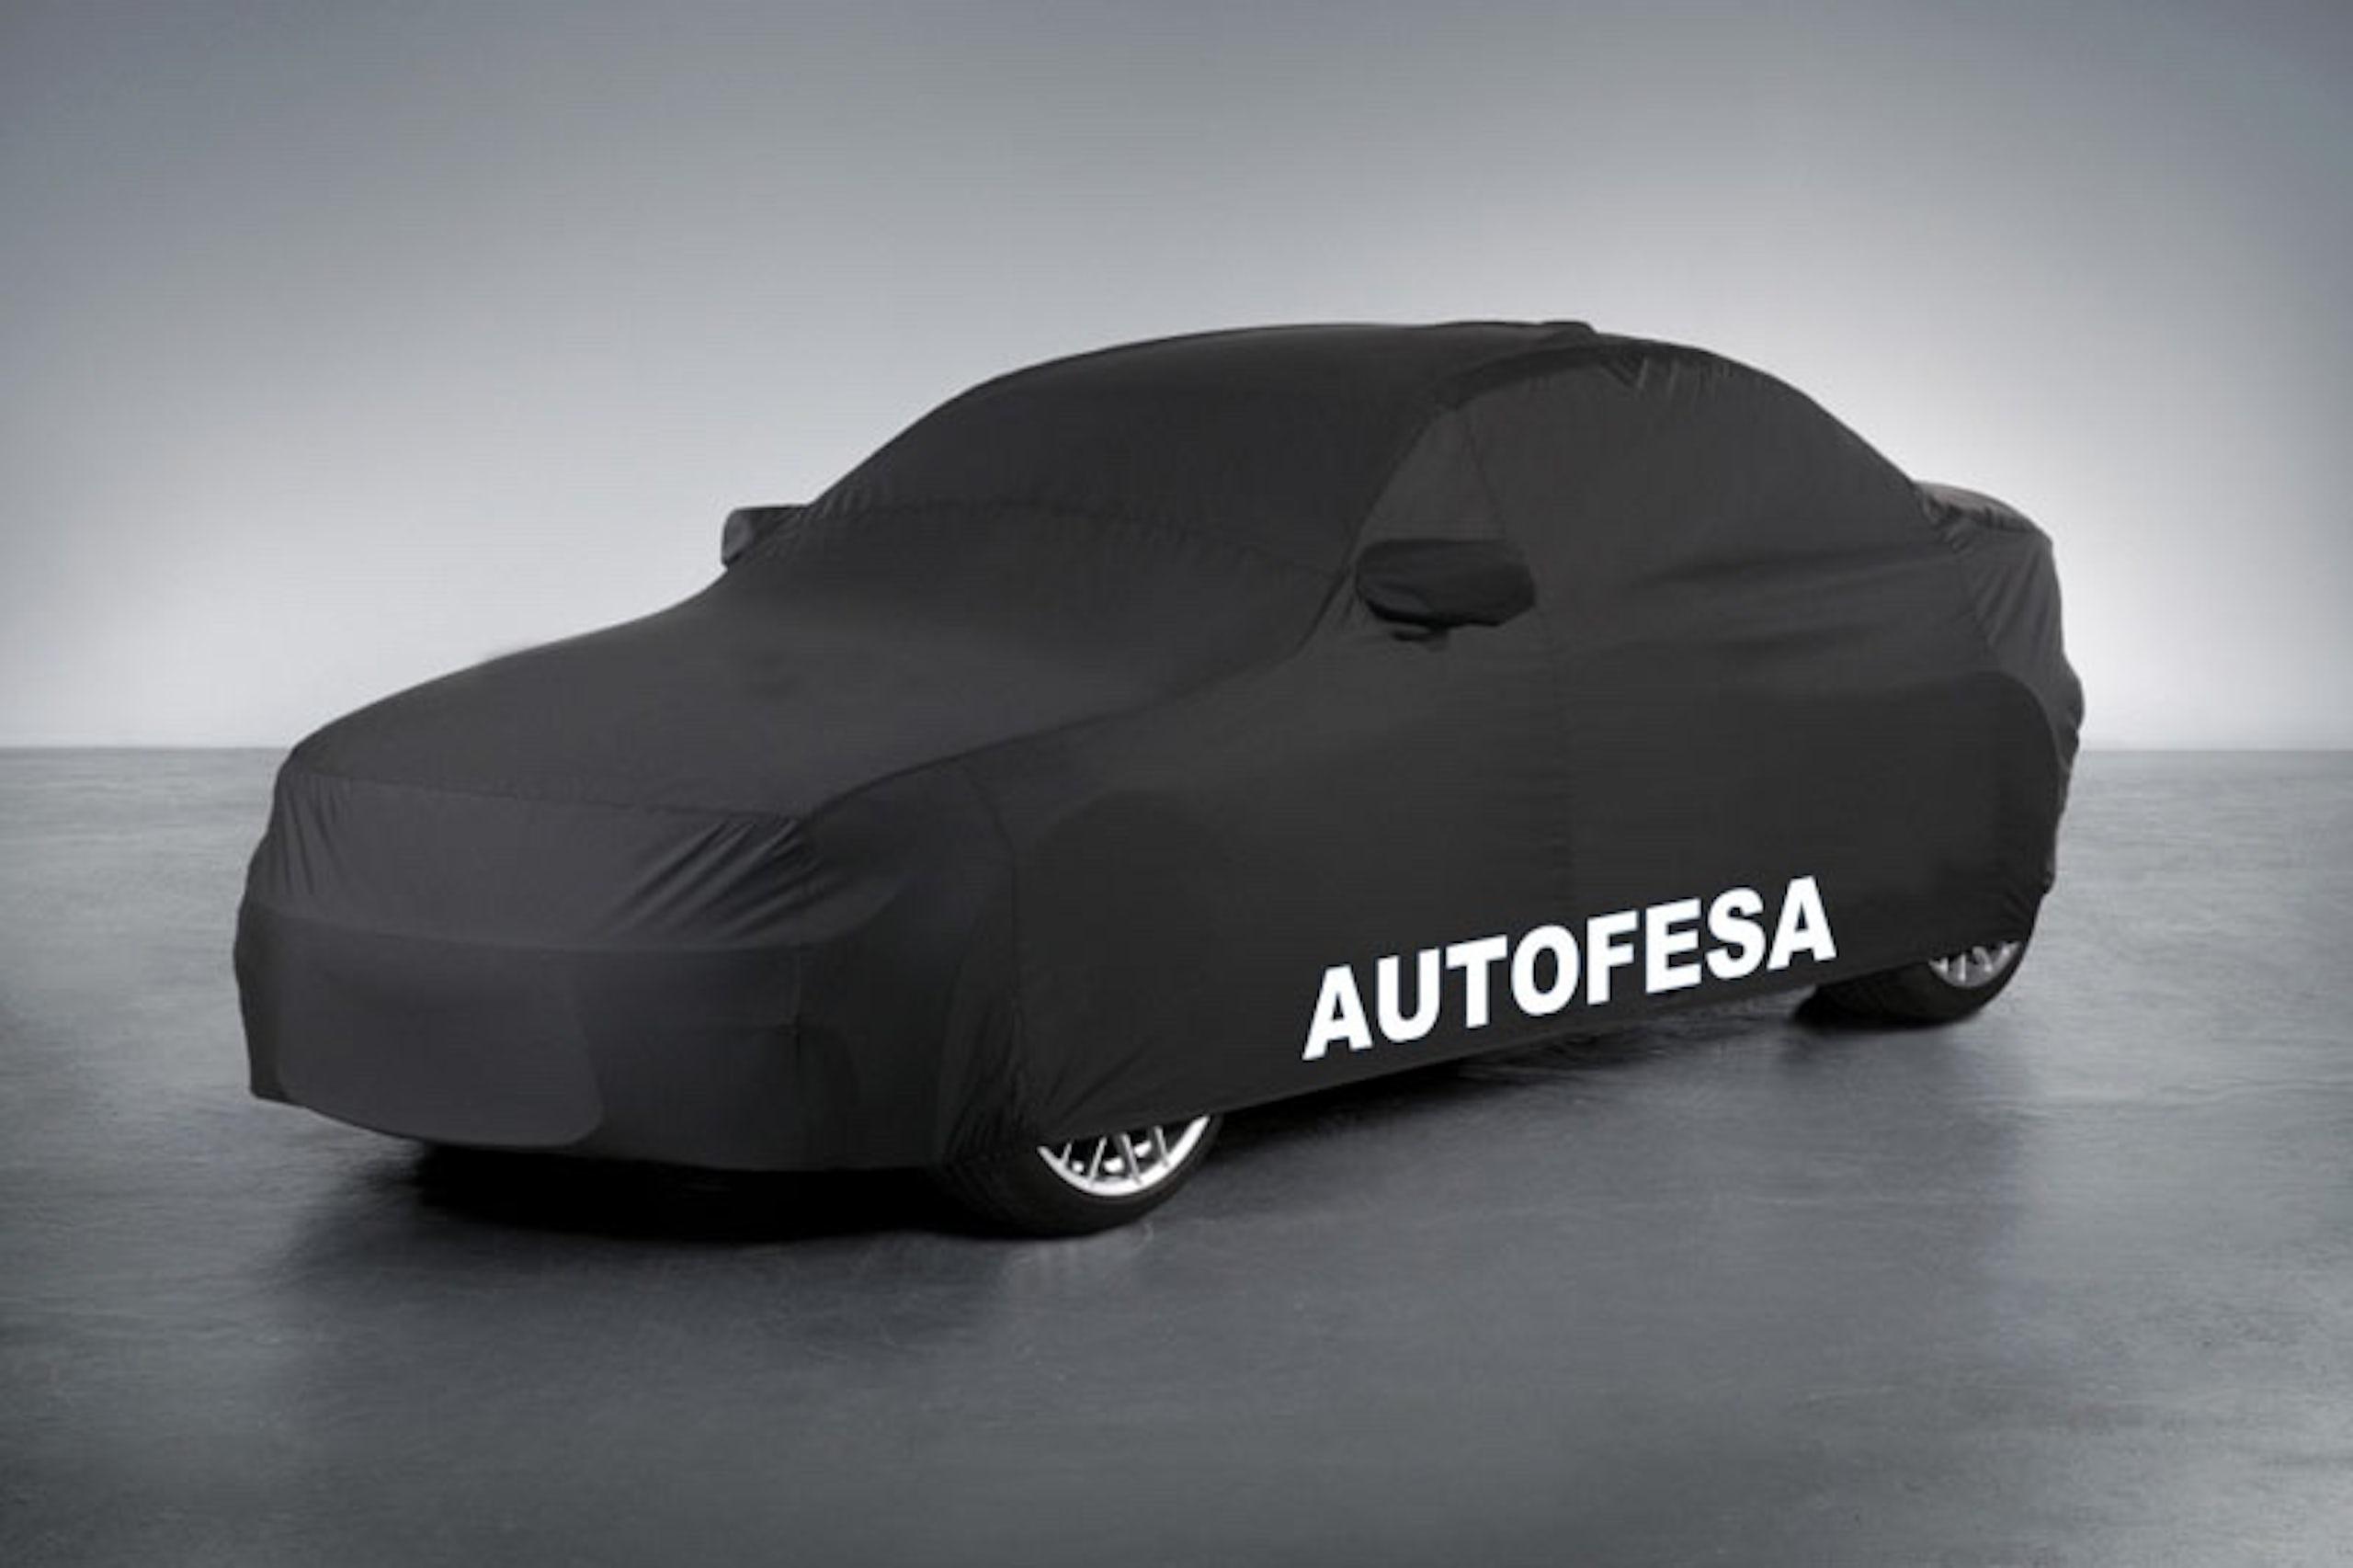 Mitsubishi Outlander 2.0 DI-D 150cv Motion 2WD 5p 7plz Auto S/S - Foto 17